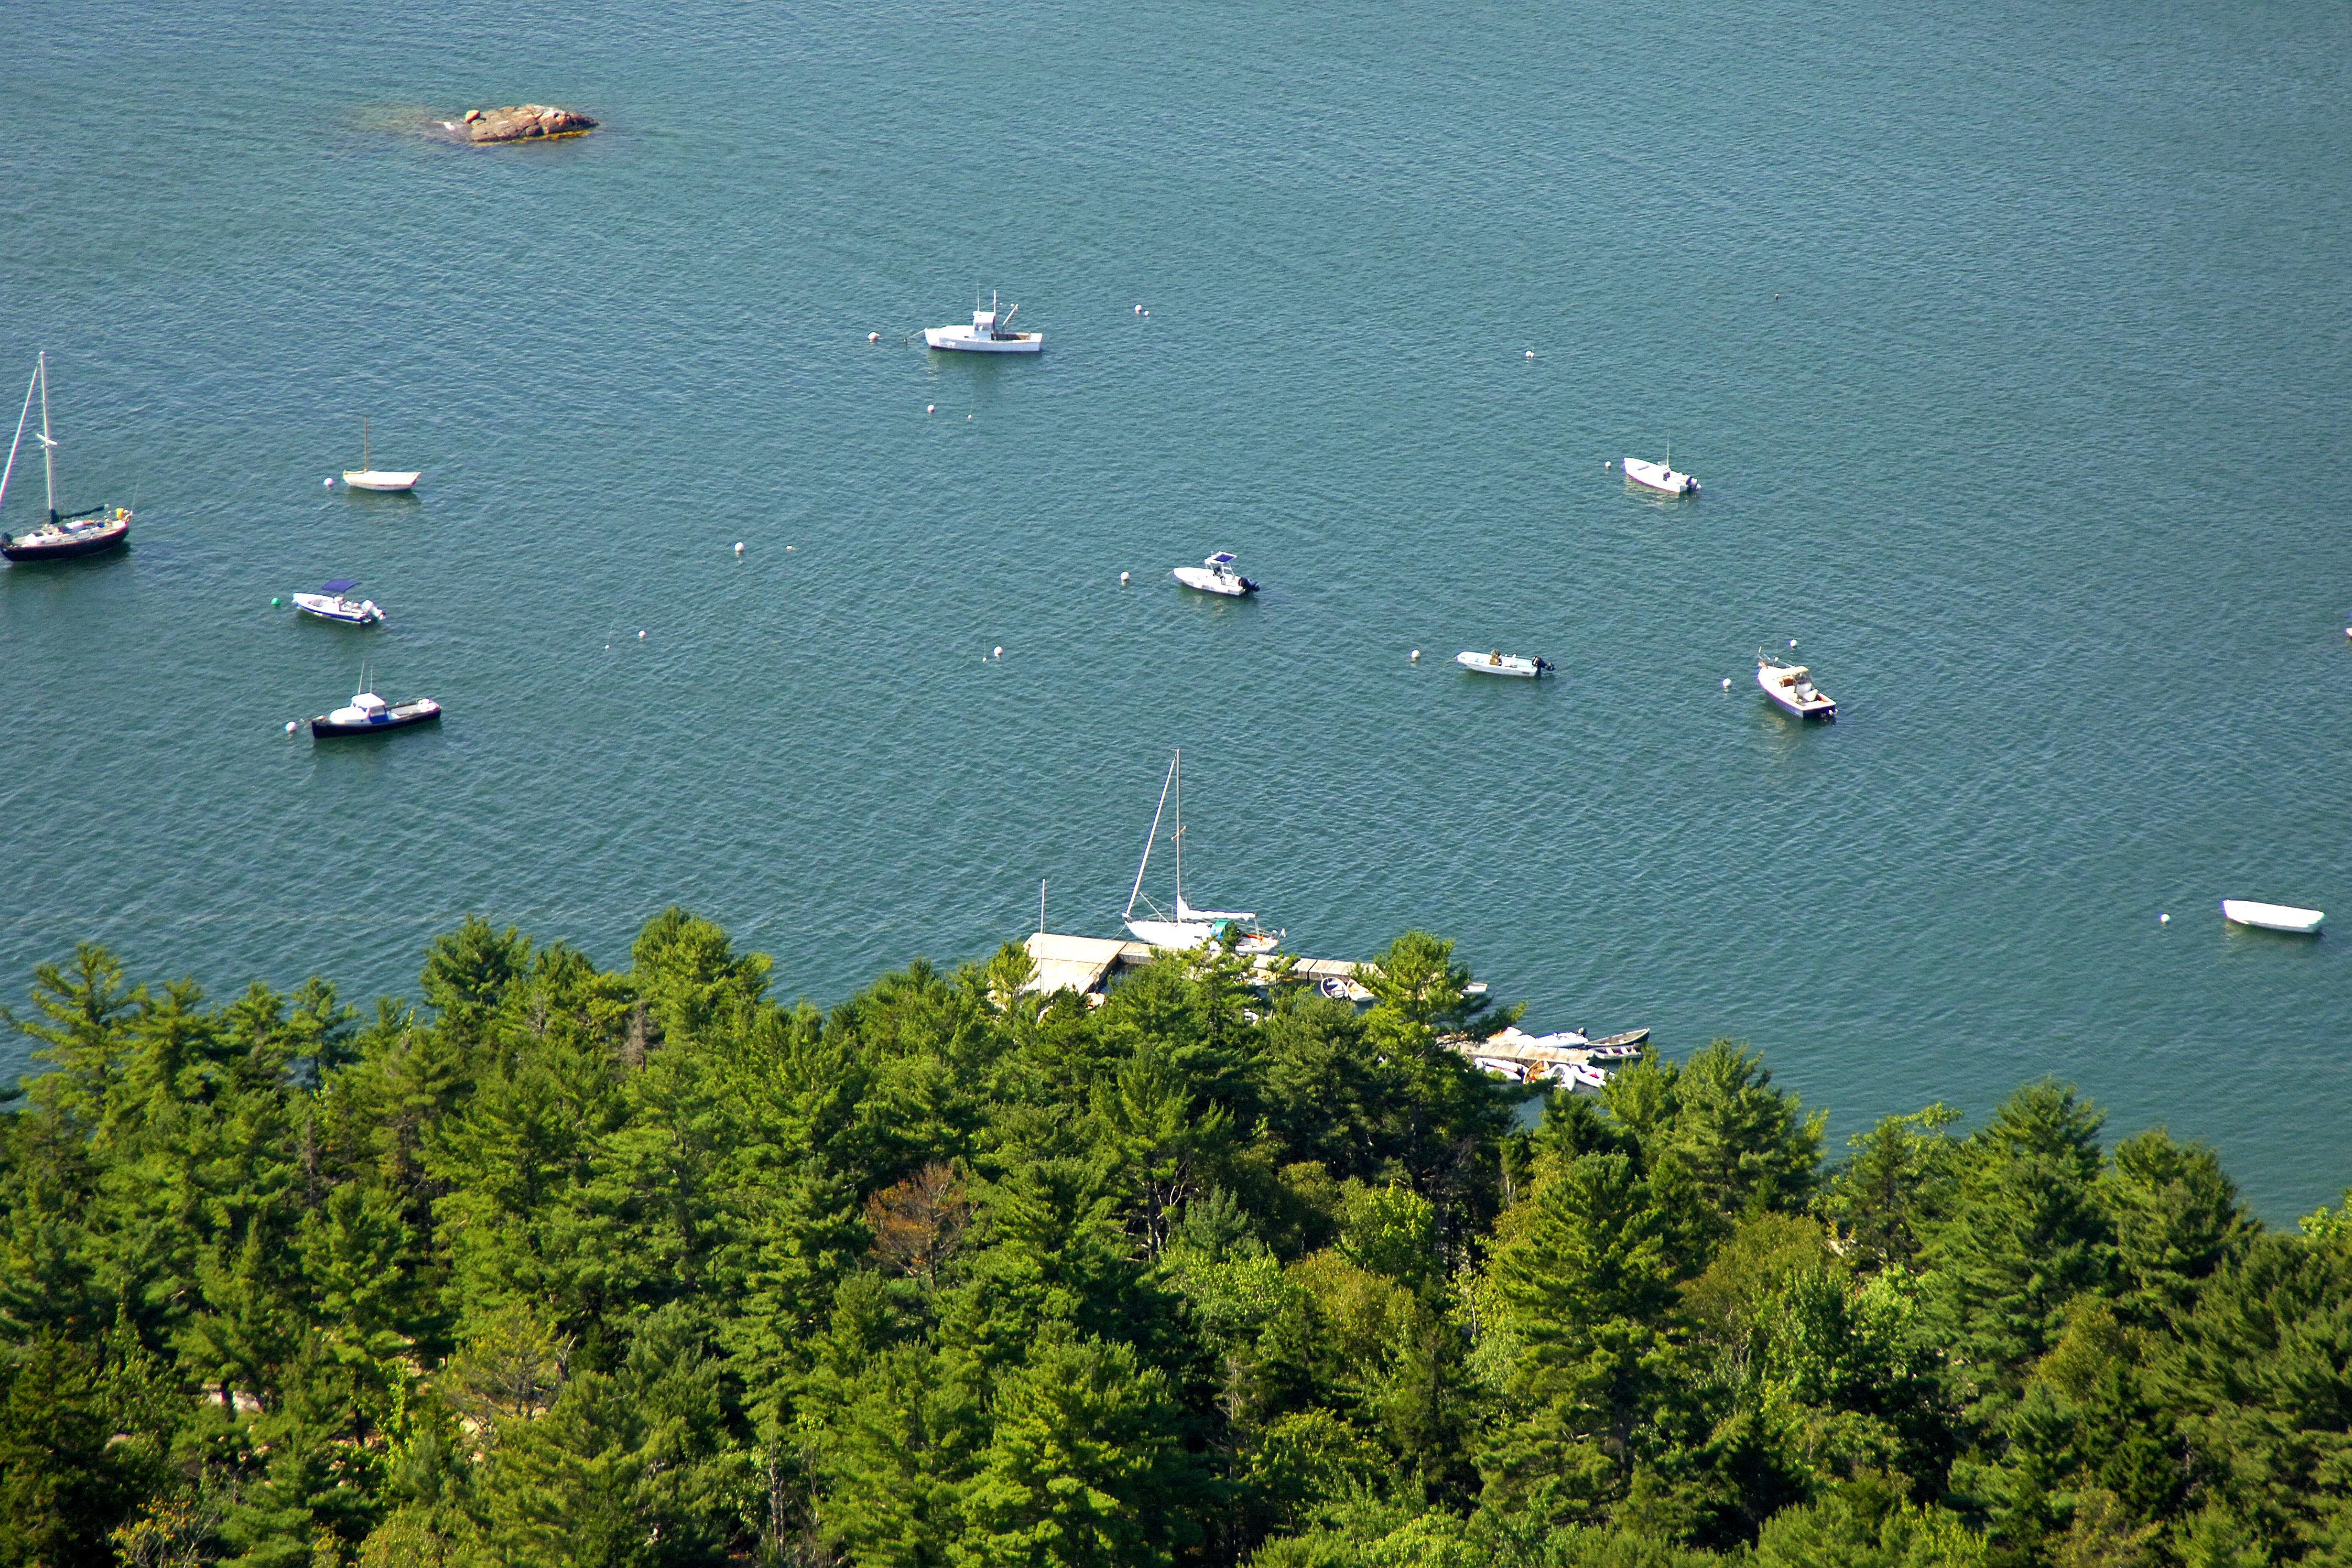 Kollegewidgwok Yacht Club in Blue Hill, ME, United States